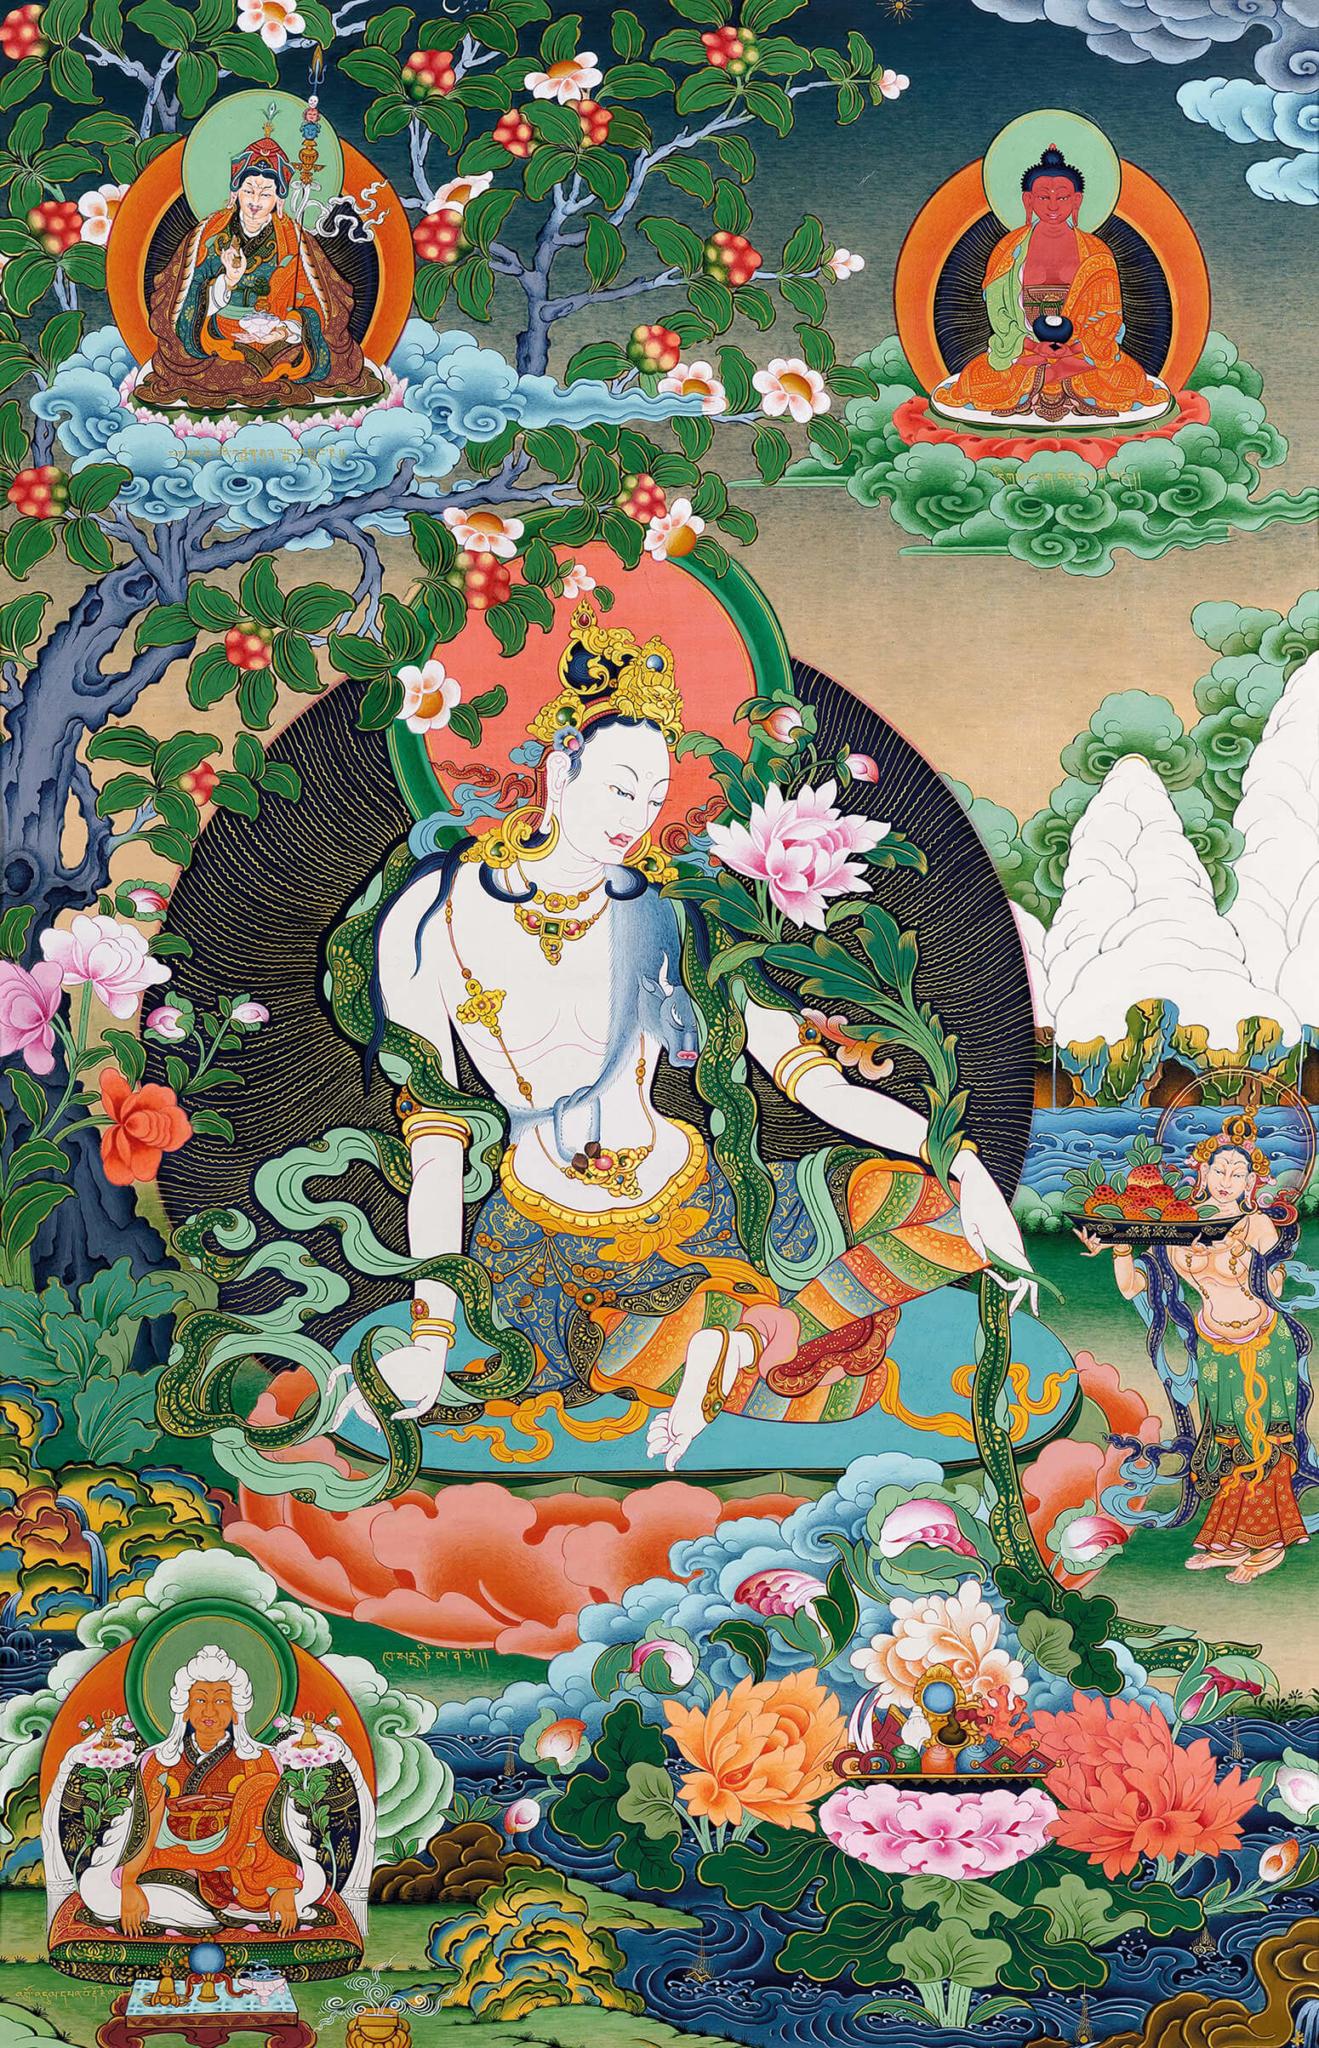 авалокитешвара, бодхисаттва, касарпани, искусство танка, дудко